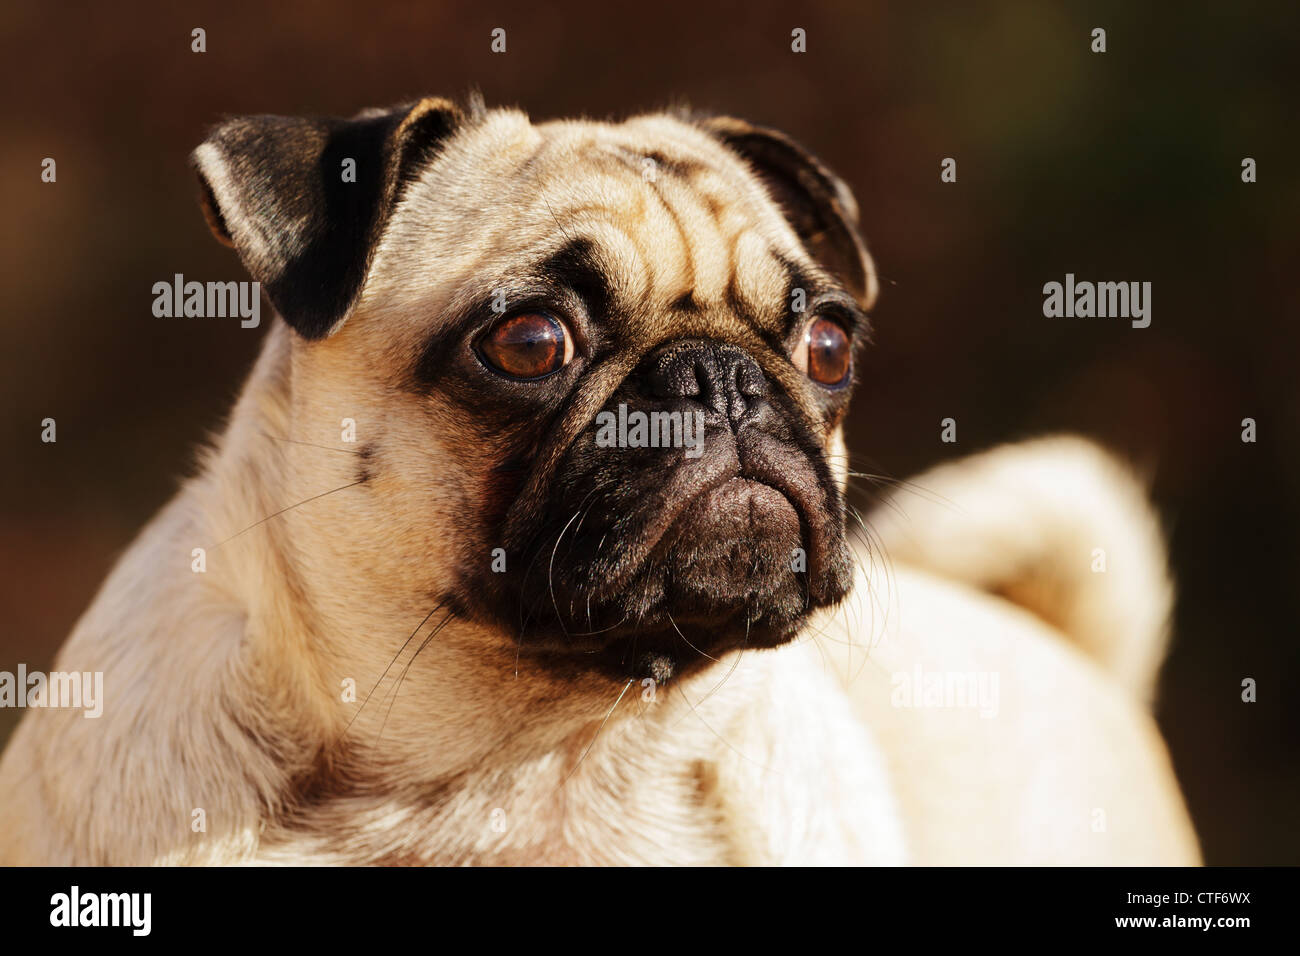 Portrait of a pet pug dog. - Stock Image